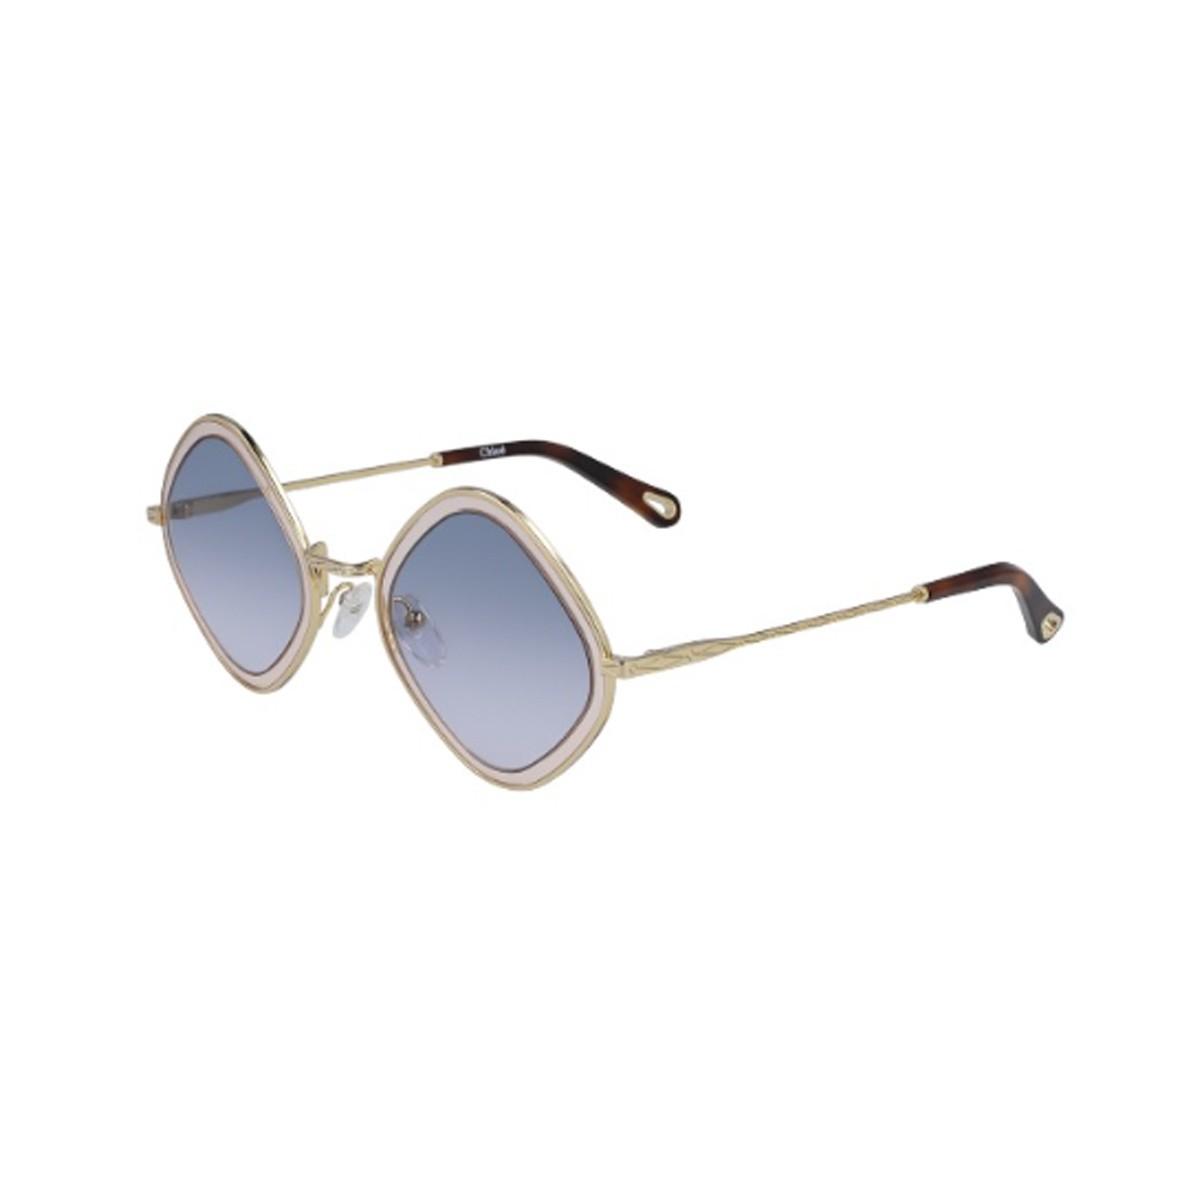 Chloé CE165S | Women's sunglasses